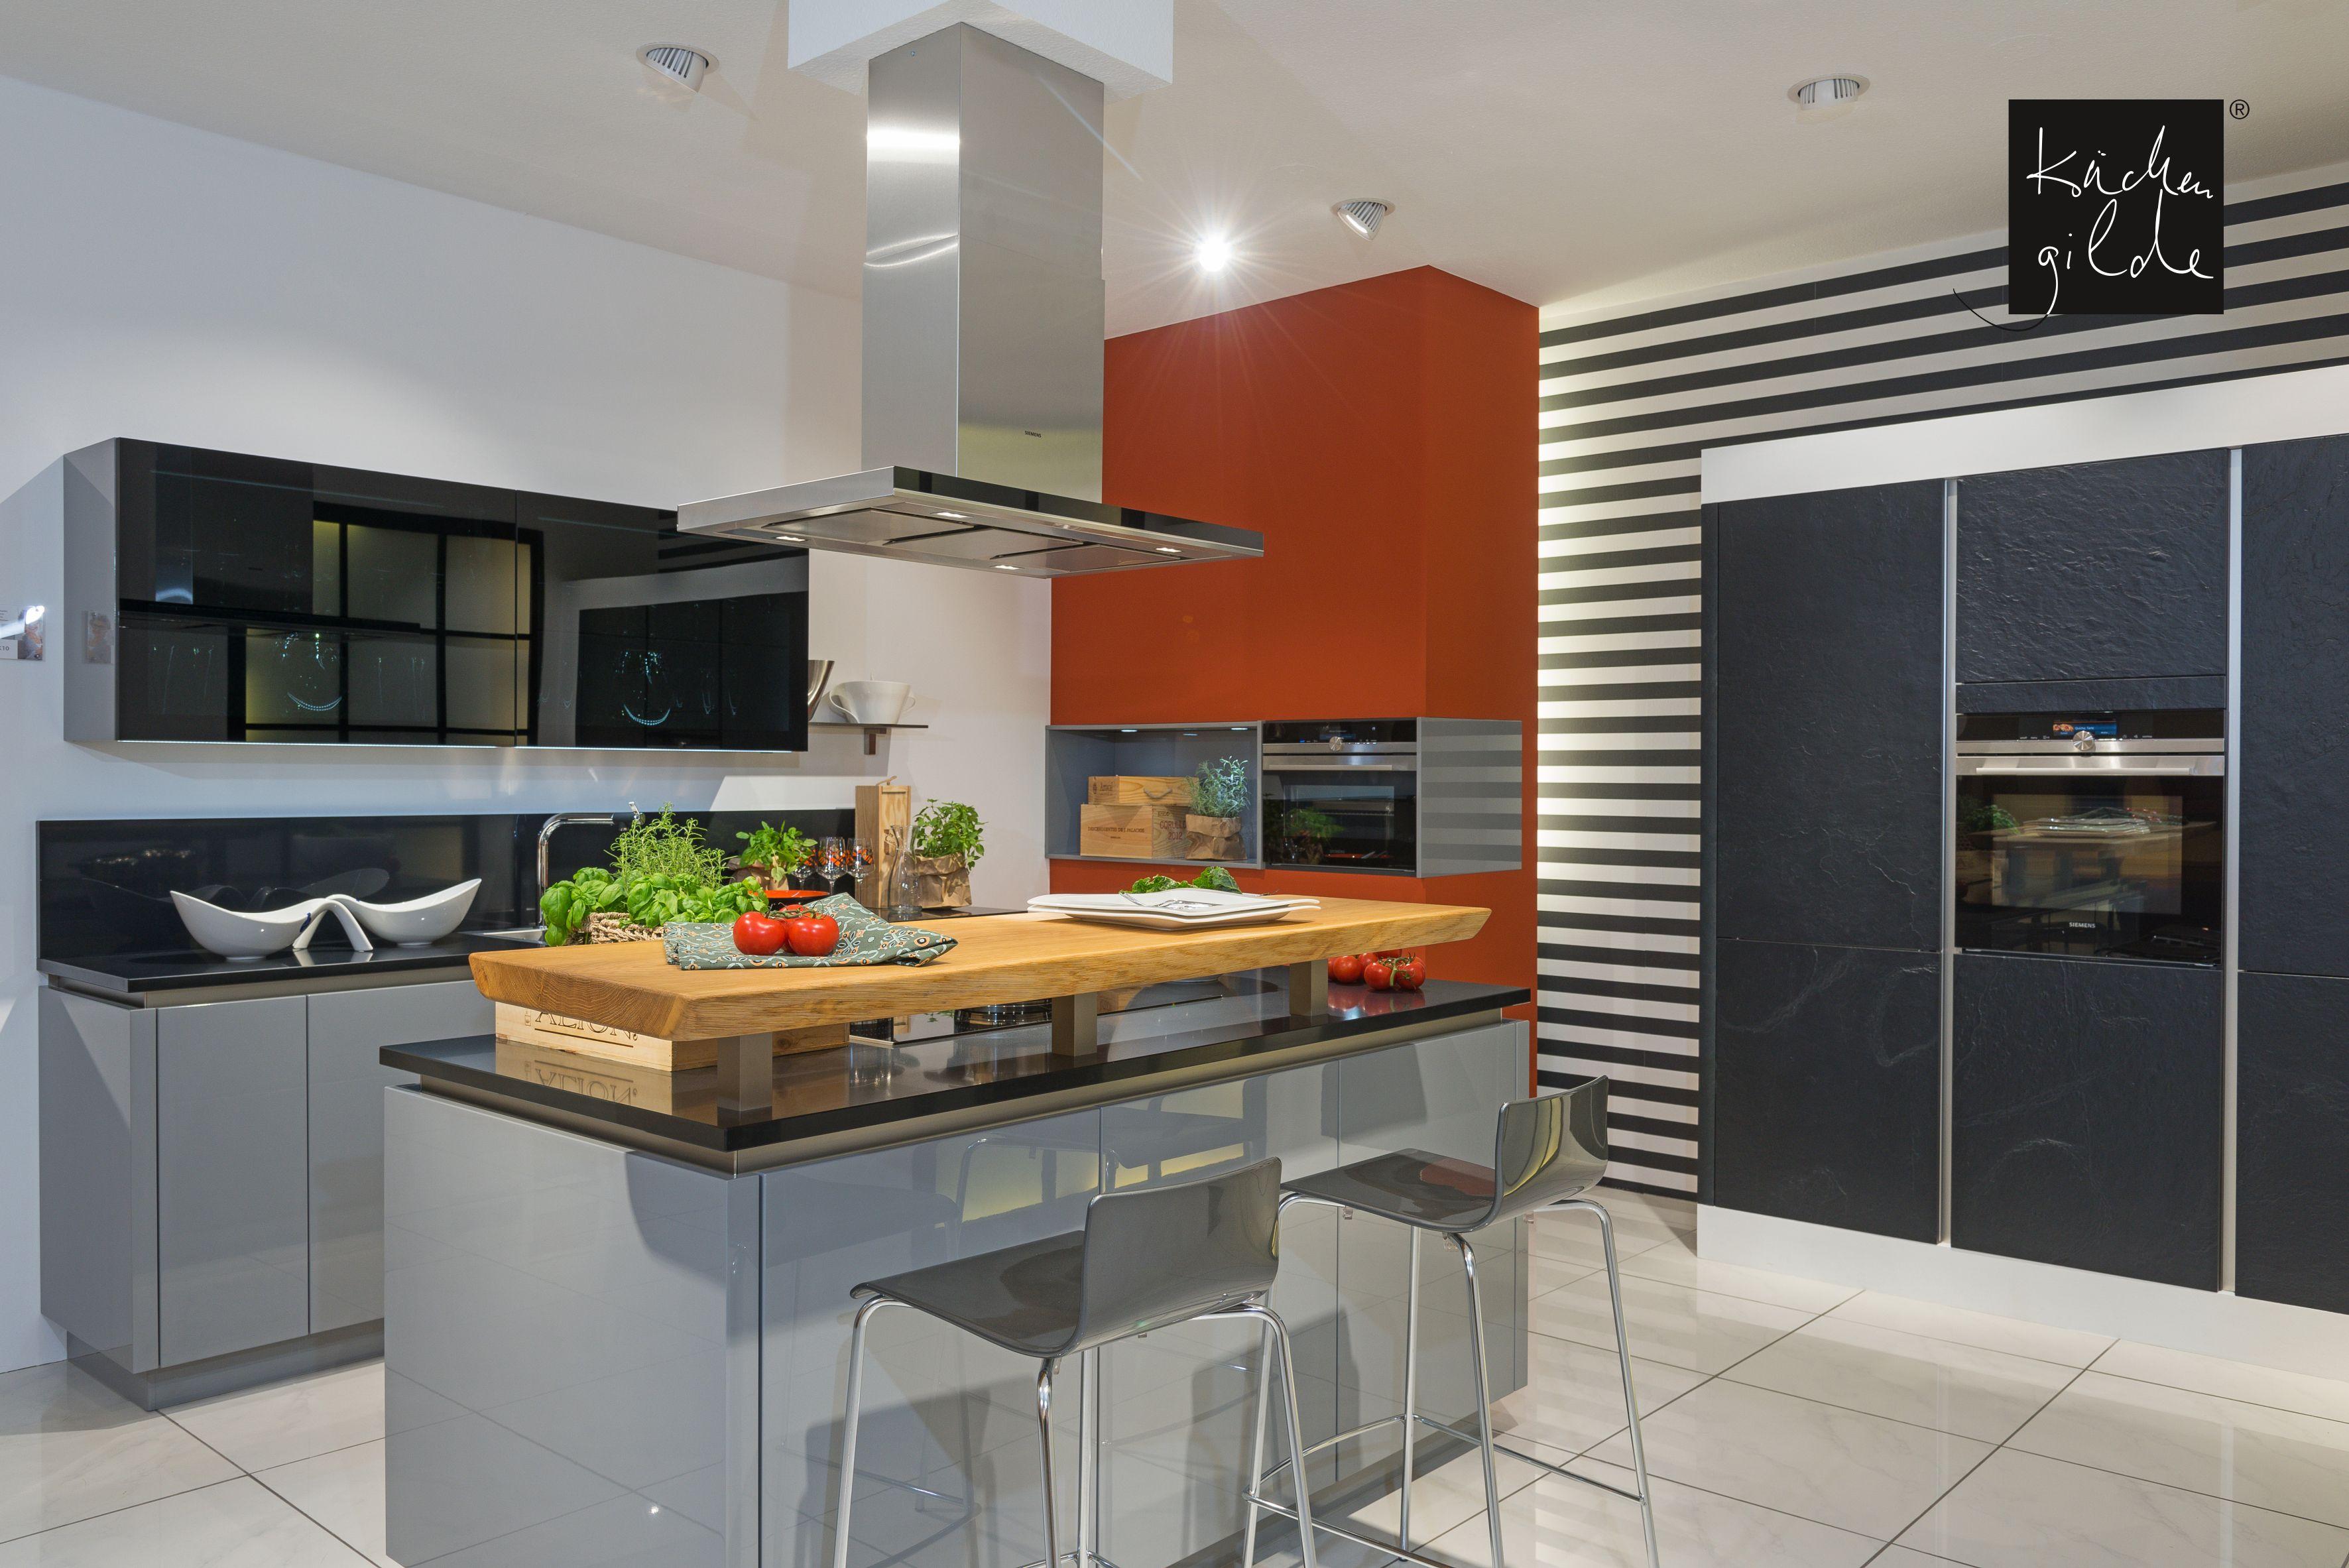 Erfreut Kücheninsel Kochhauben Fotos - Küchenschrank Ideen ...